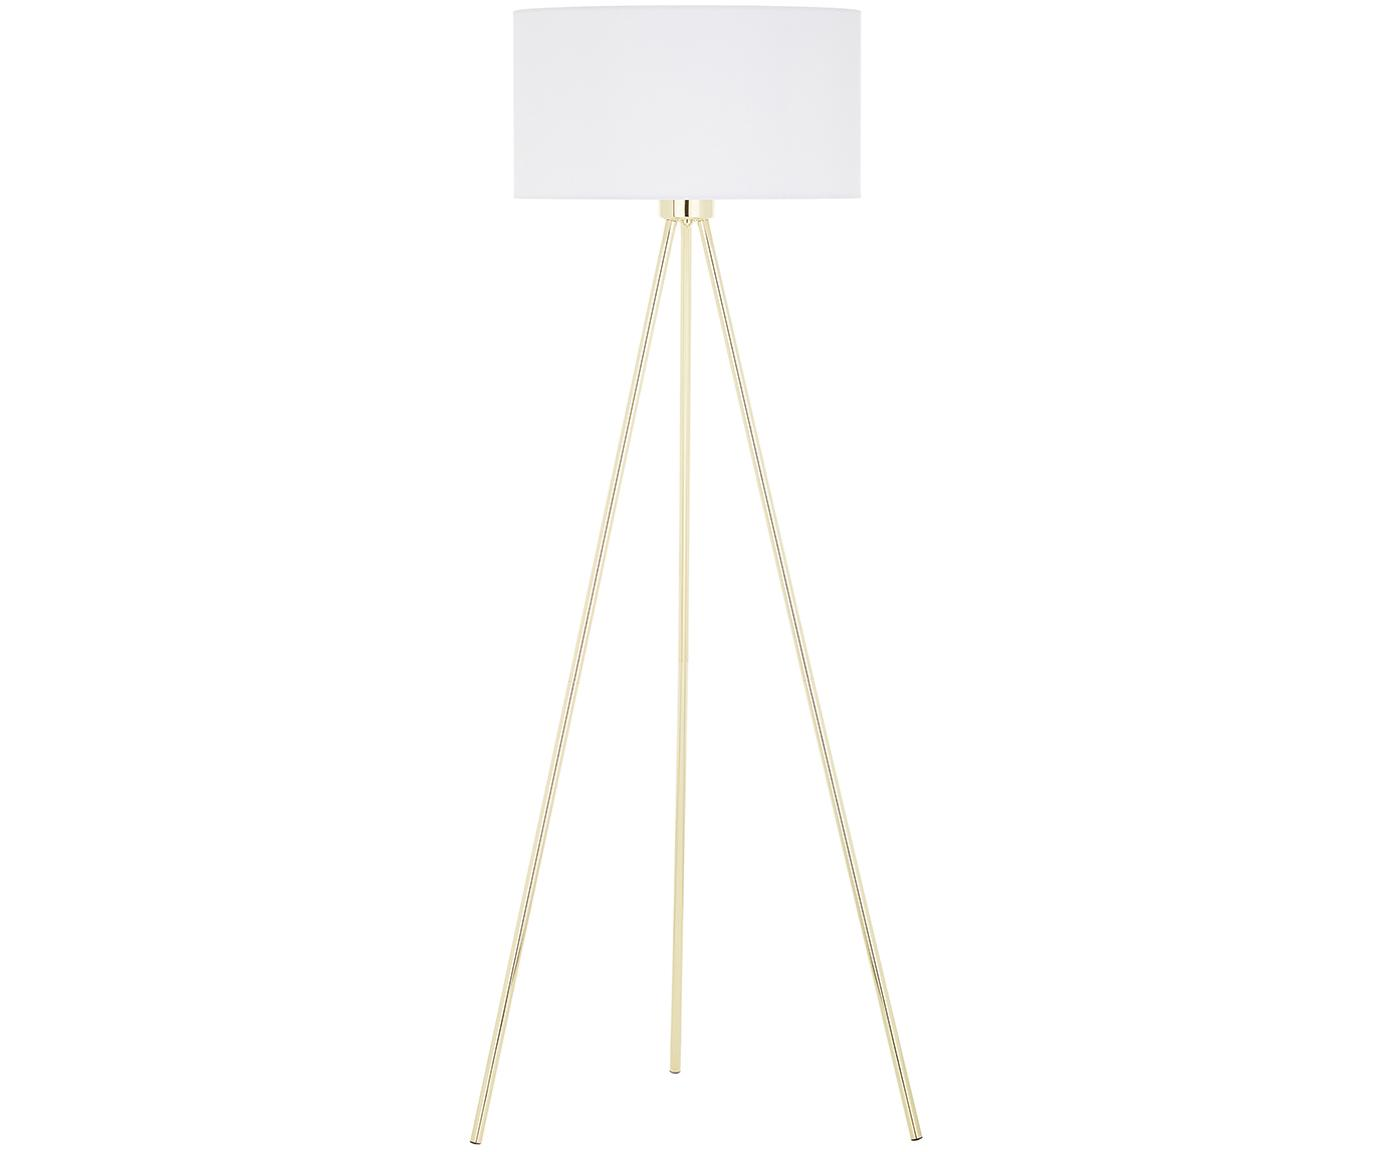 Lampada da terra Cella, Paralume: cotone, Base della lampada: metallo, Base della lampada: dorato lucido Paralume: bianco, Ø 45 x Alt. 148 cm